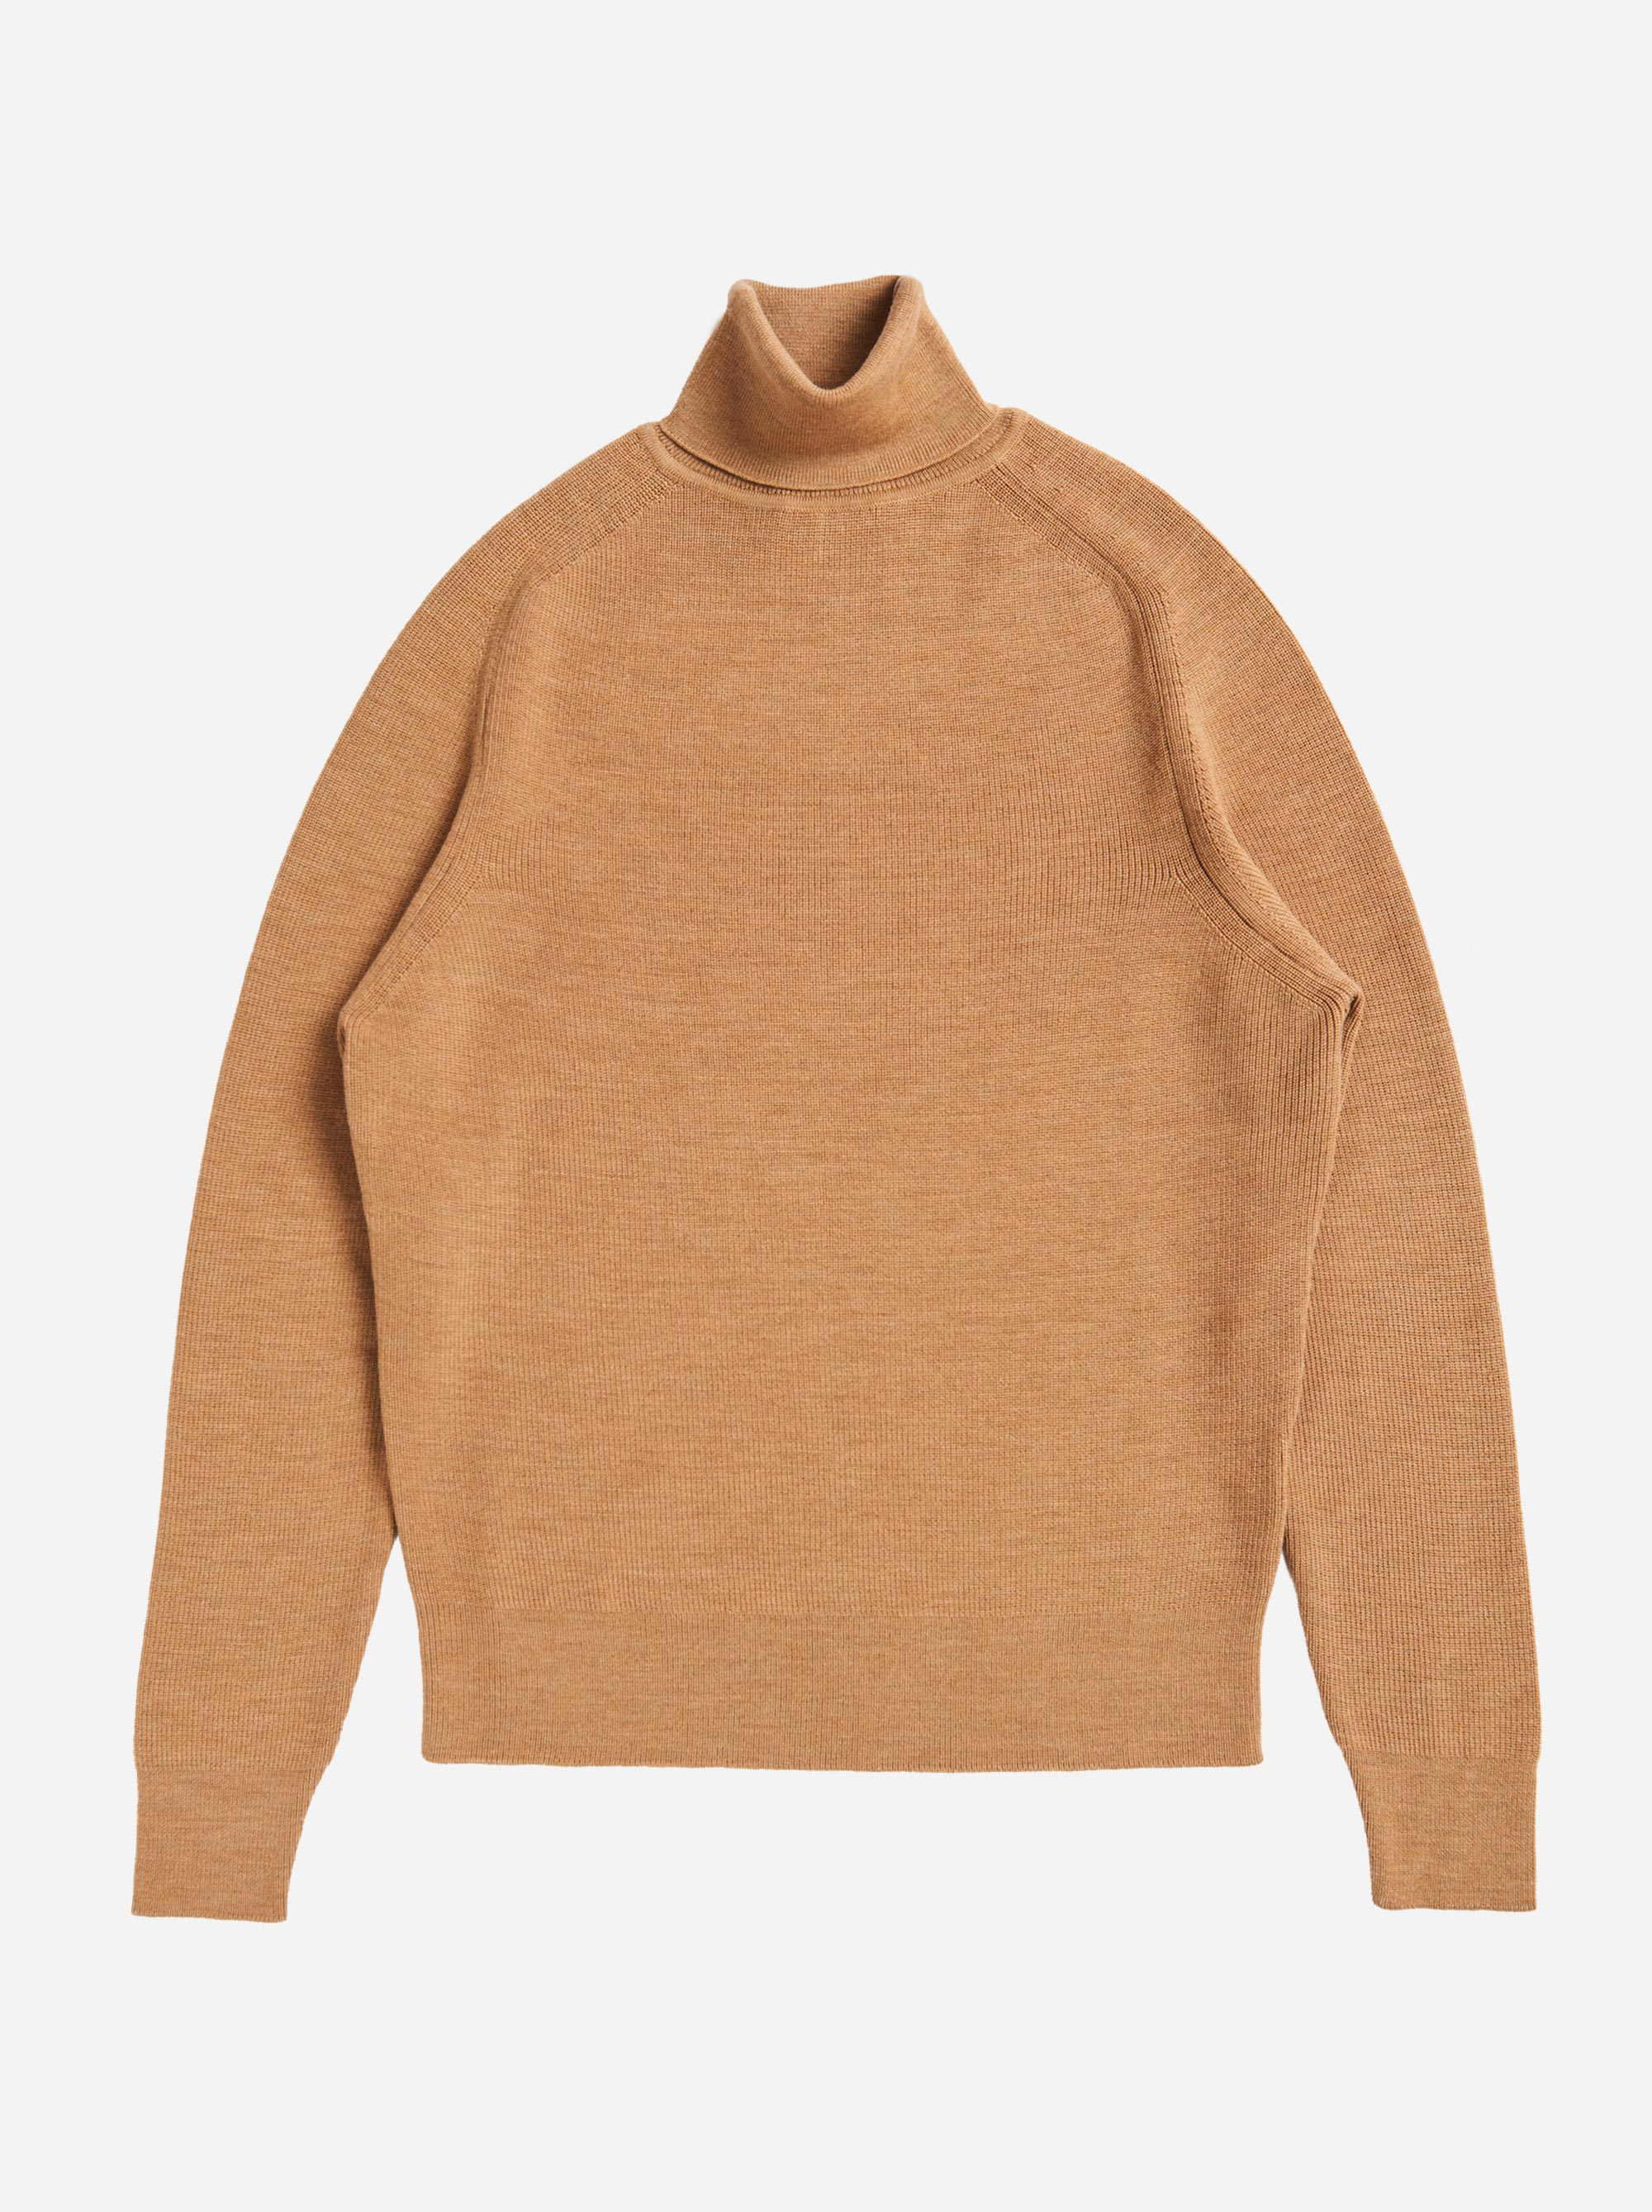 Teym - Turtleneck - The Merino Sweater - Men - Camel - 4